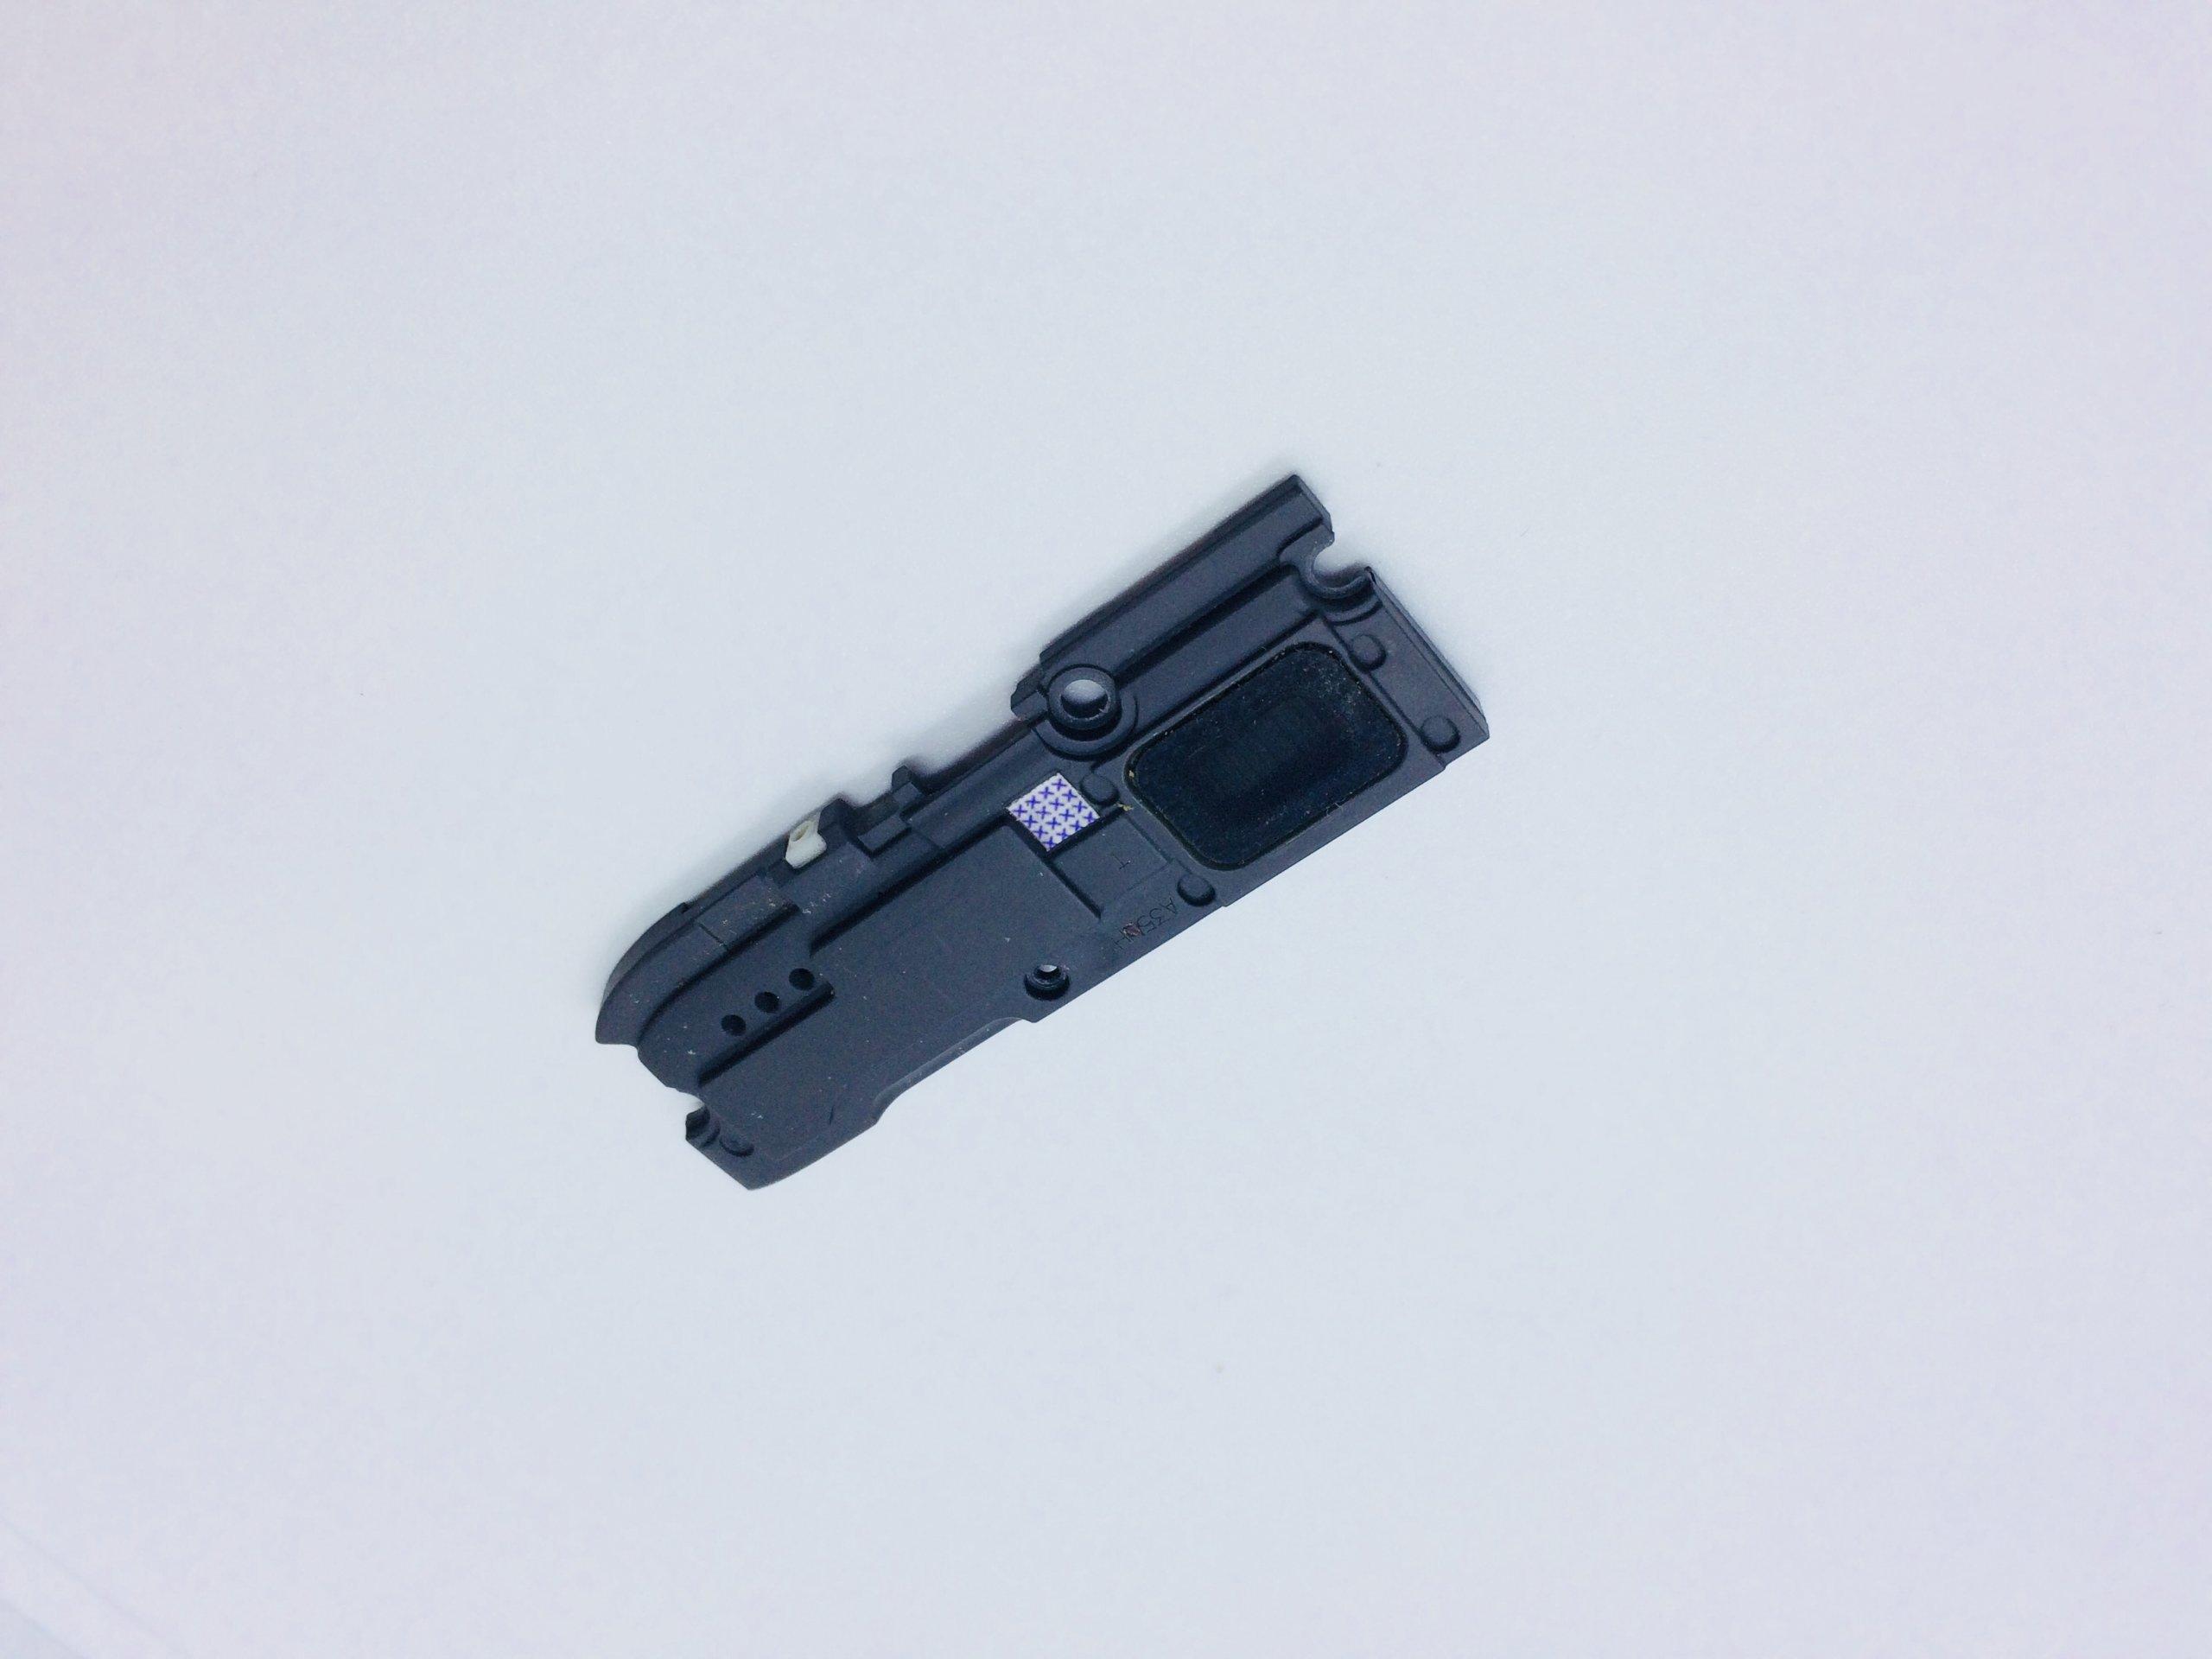 ORG BUZZER GŁOŚNIK SAMSUNG N7100 Note2 II 23%